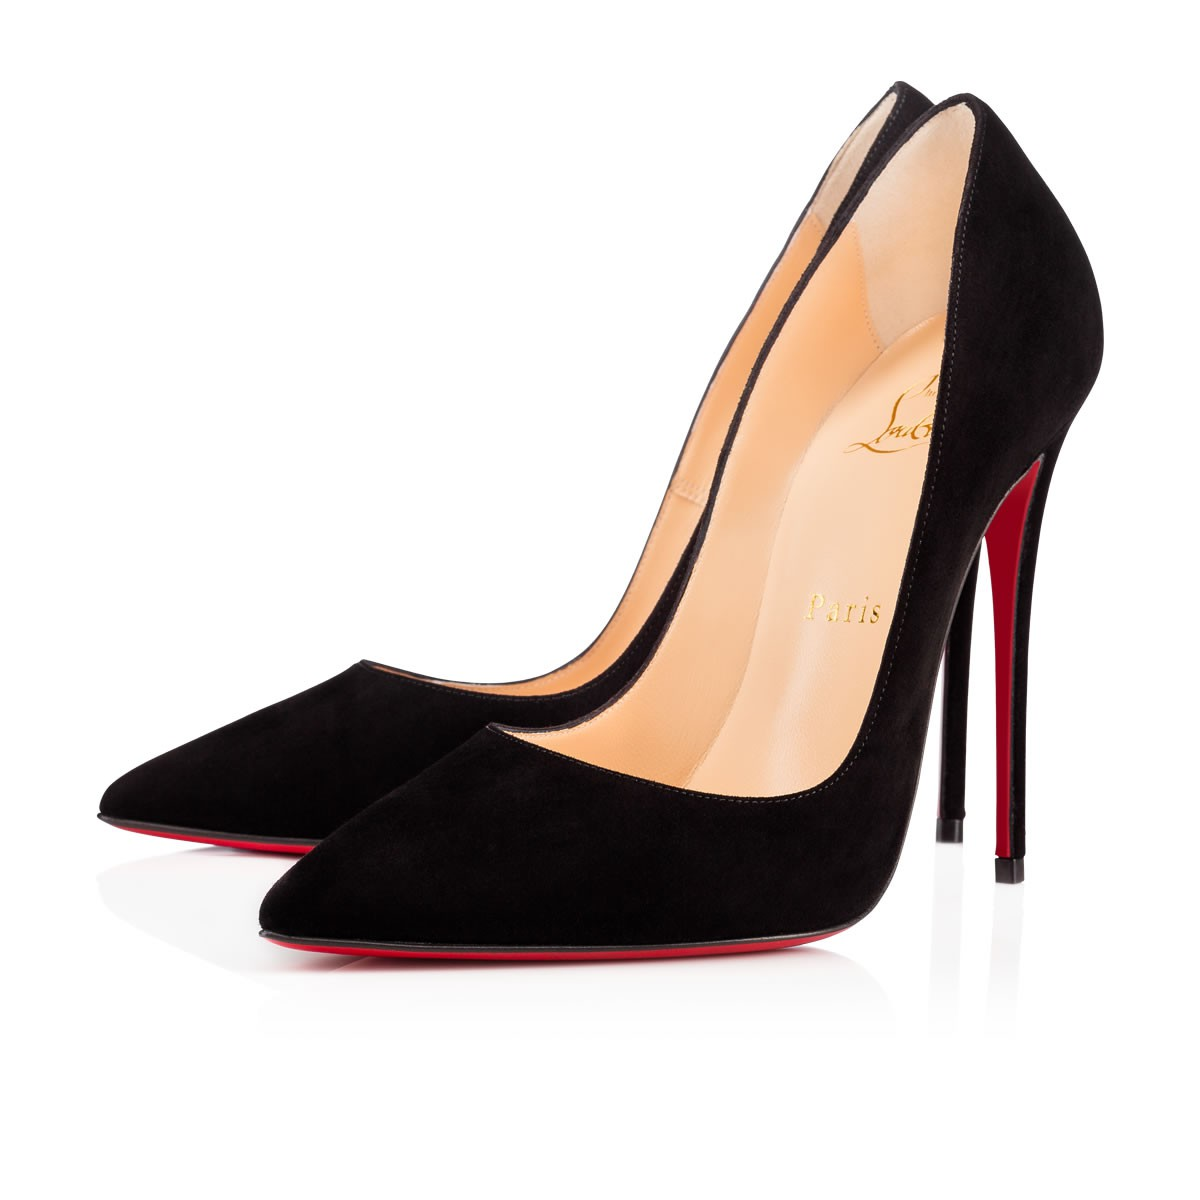 21cbe6fa890 So Kate 120 Black Suede - Women Shoes - Christian Louboutin